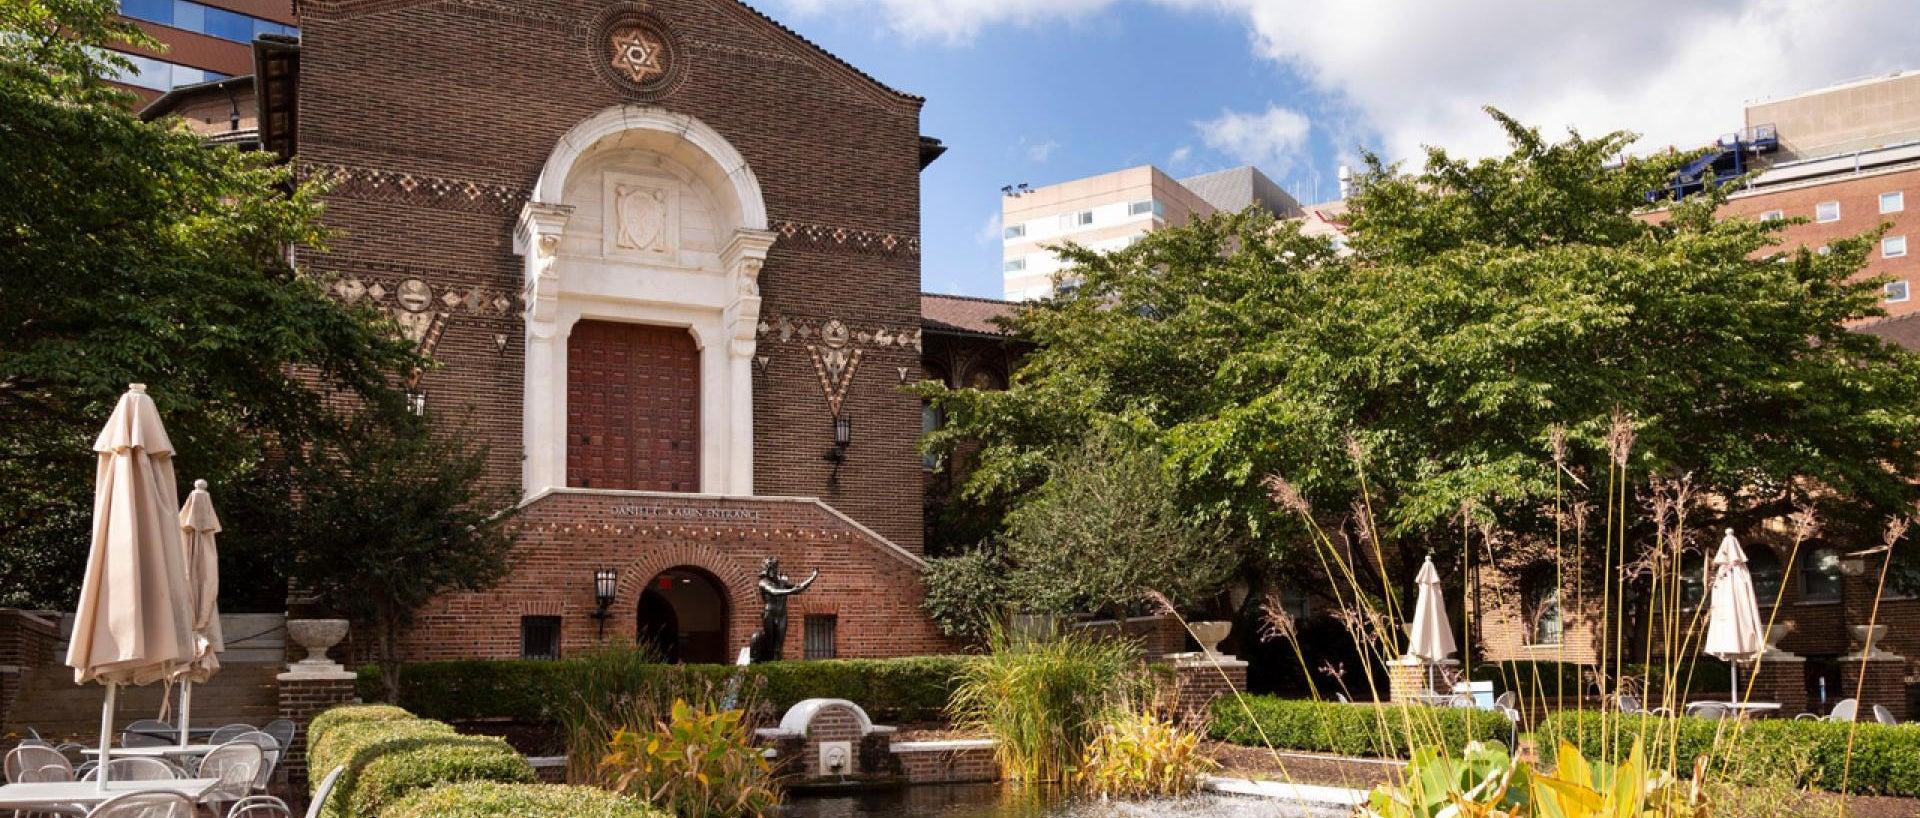 The Penn Museum at University of Pennsylvania